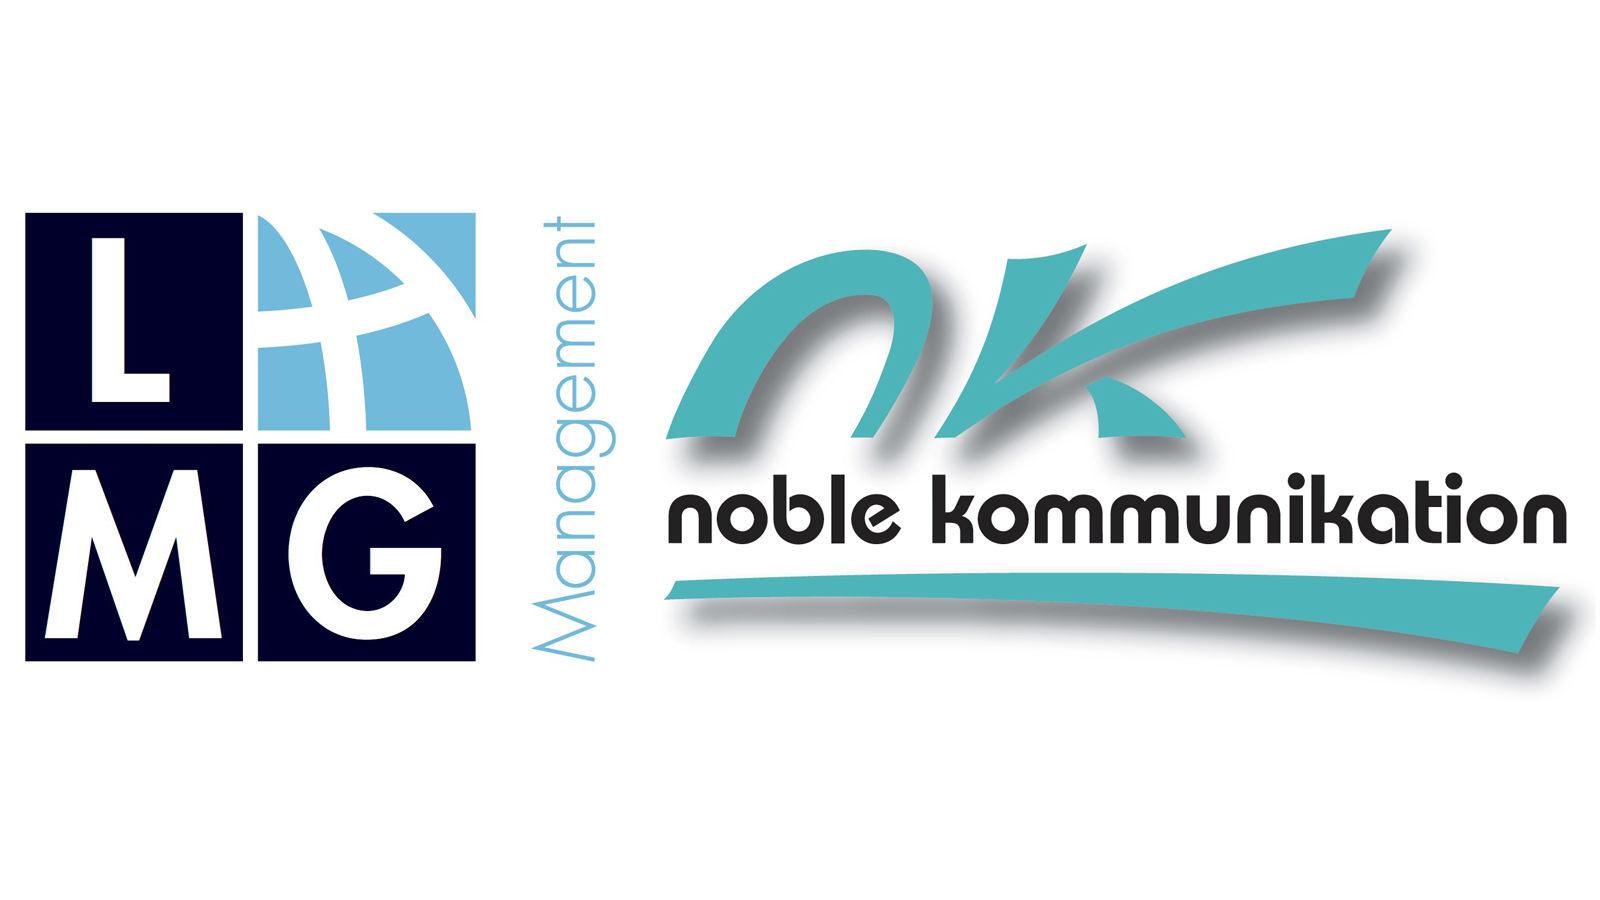 Logos LMG Management und noble kommunikation